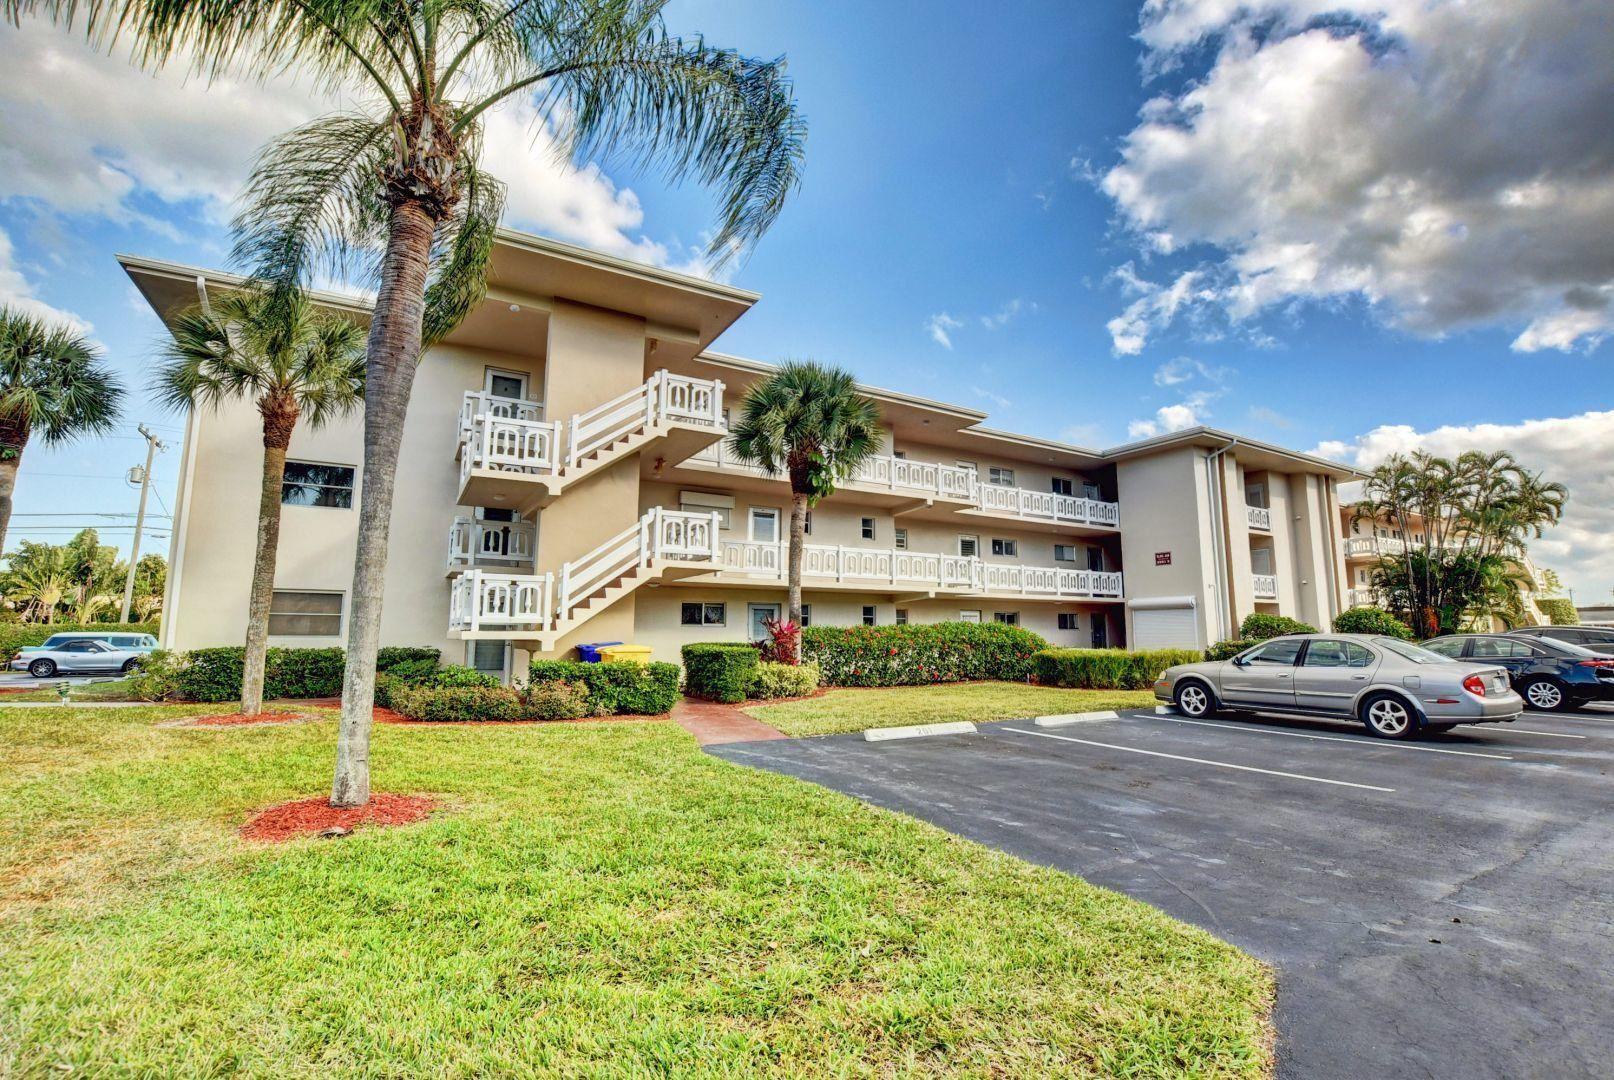 2991 S Garden Drive #107, Lake Worth, FL 33461 - #: RX-10690905